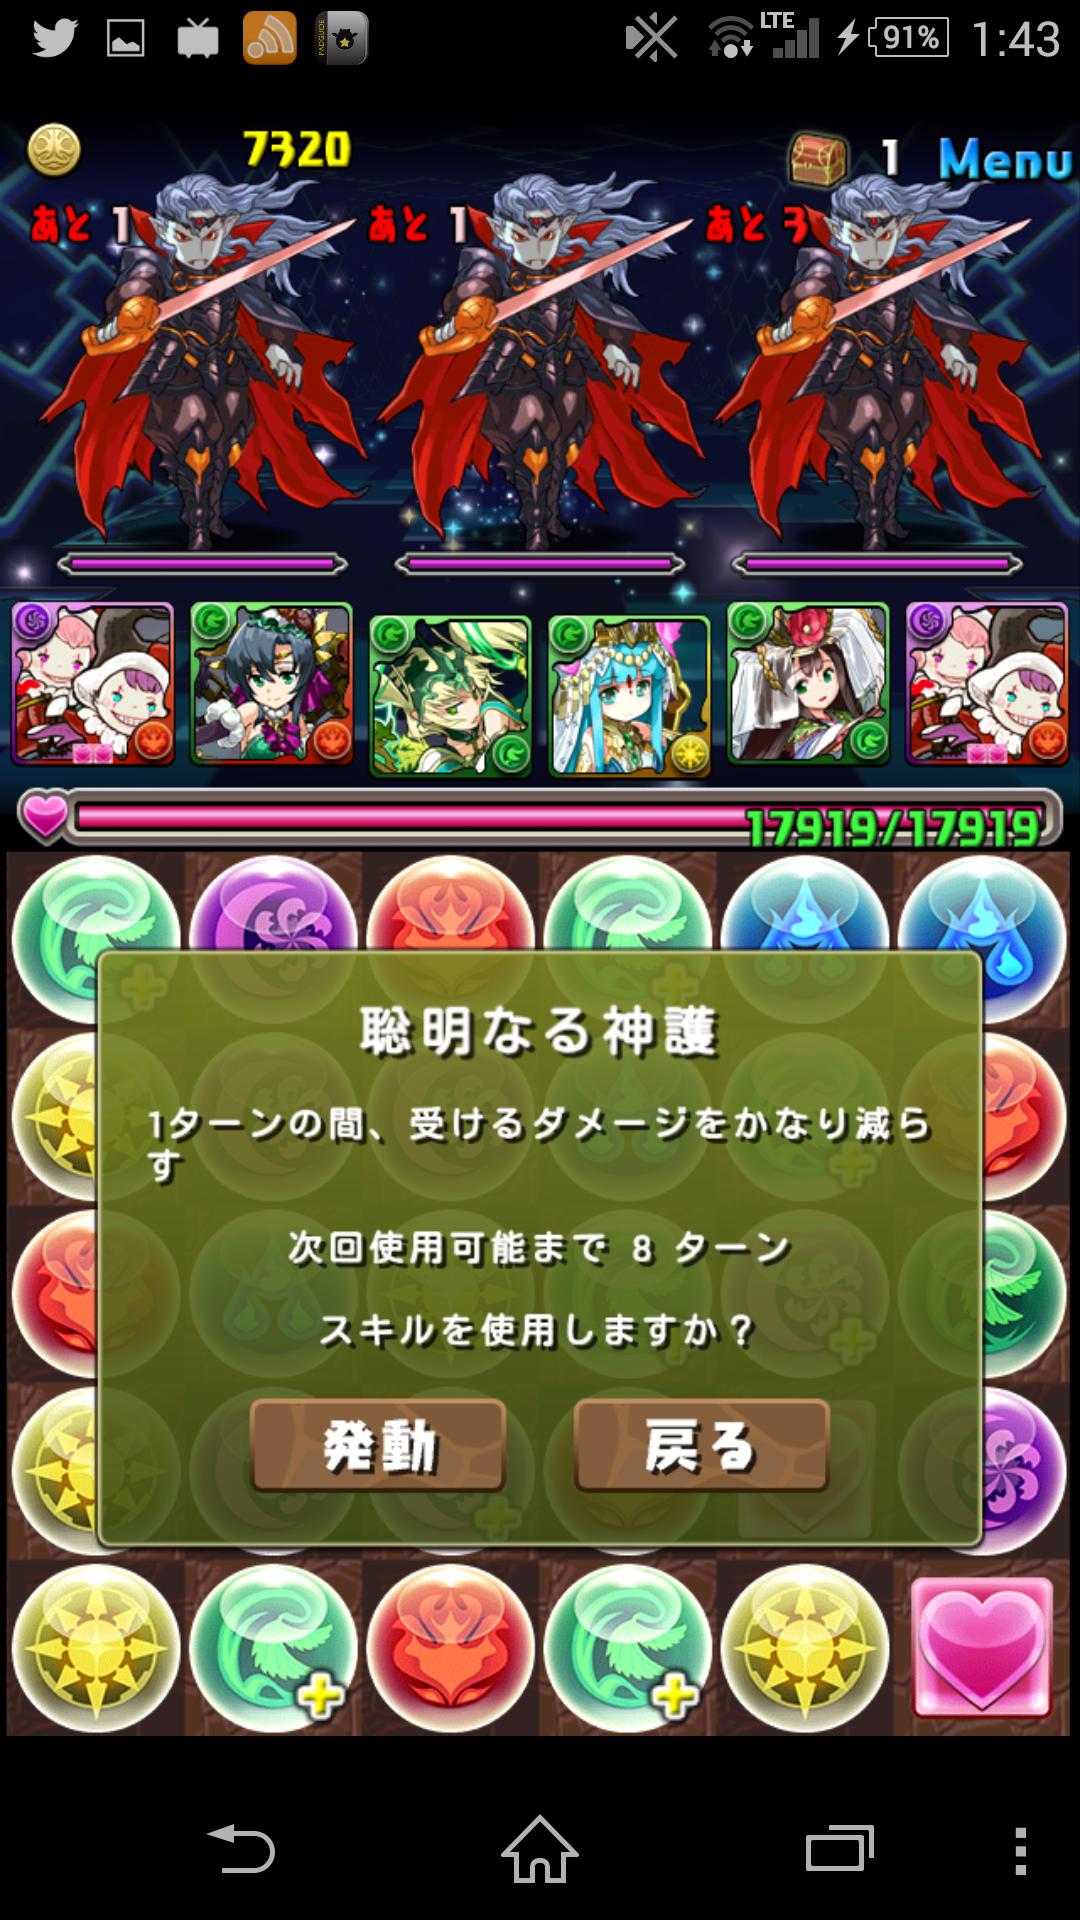 Screenshot_2015-03-04-01-43-47.png